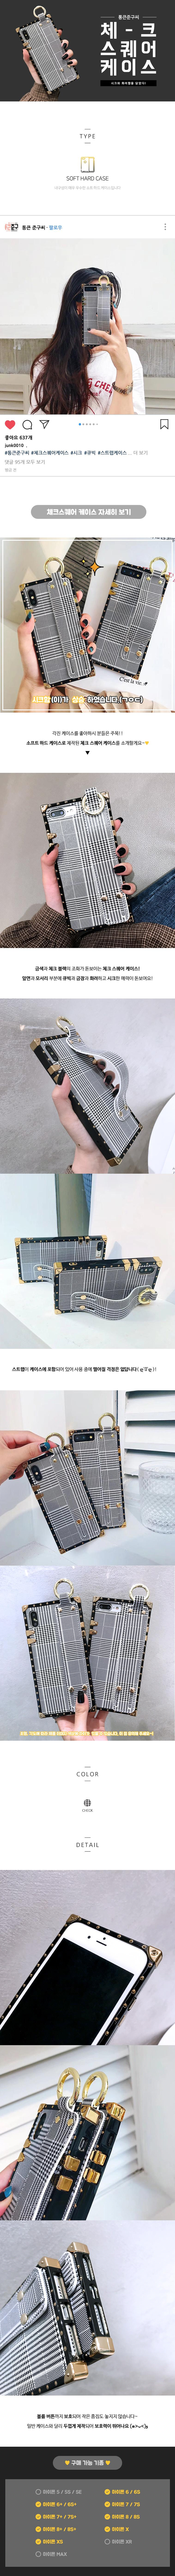 Check Square iPhone Case